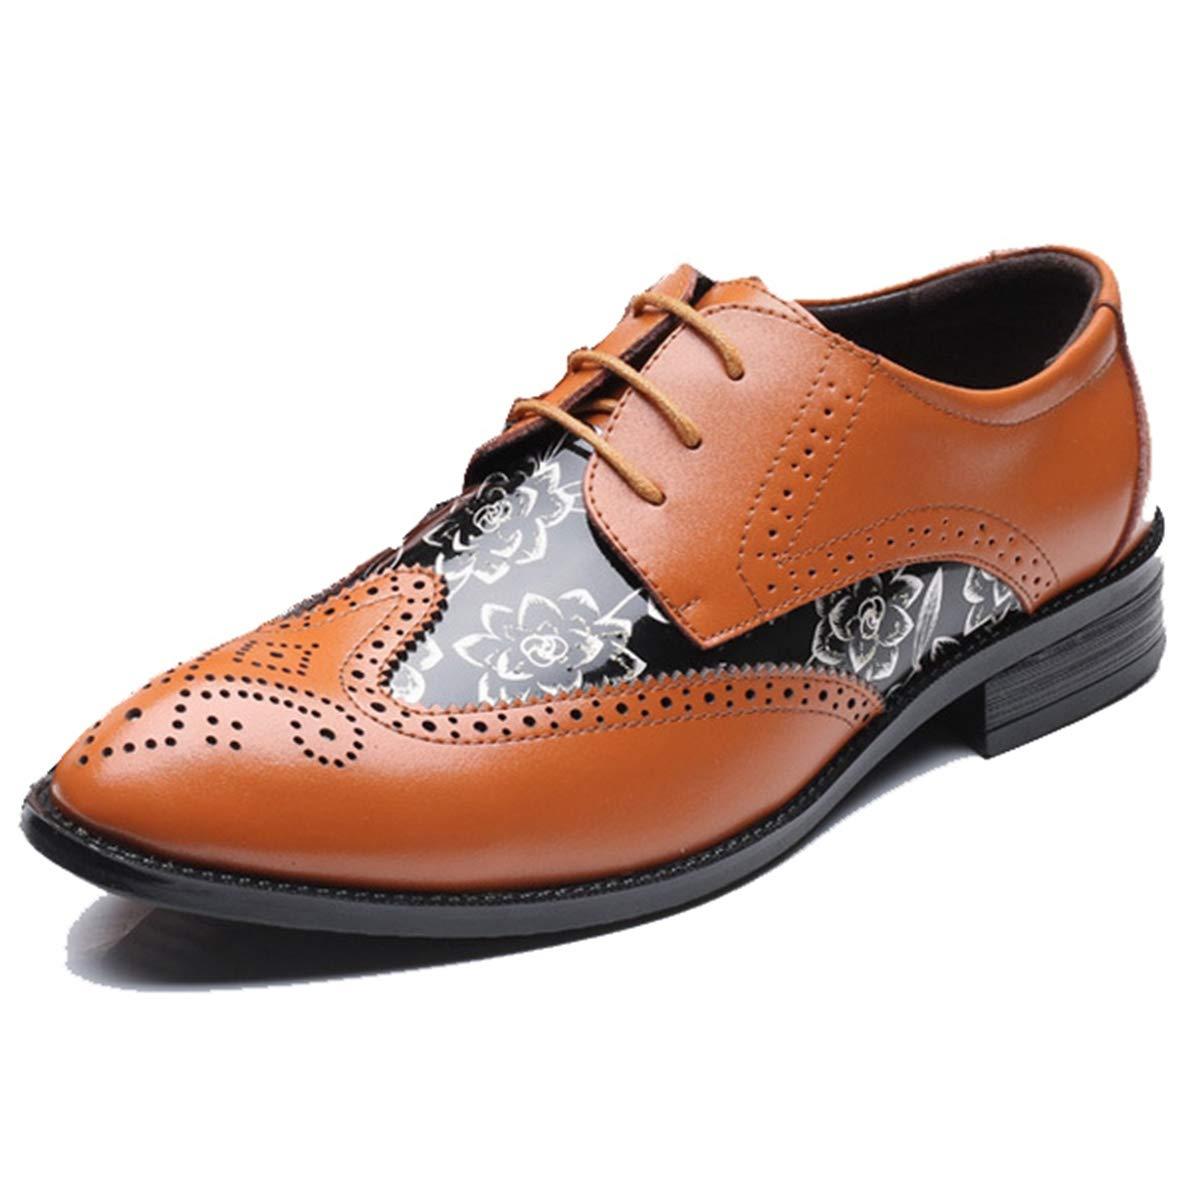 new style aa387 cfdef FOXSENSE Floral Premium Premium Premium Genuine Leather Round Toe Oxford  Shoes for Men 9 M US